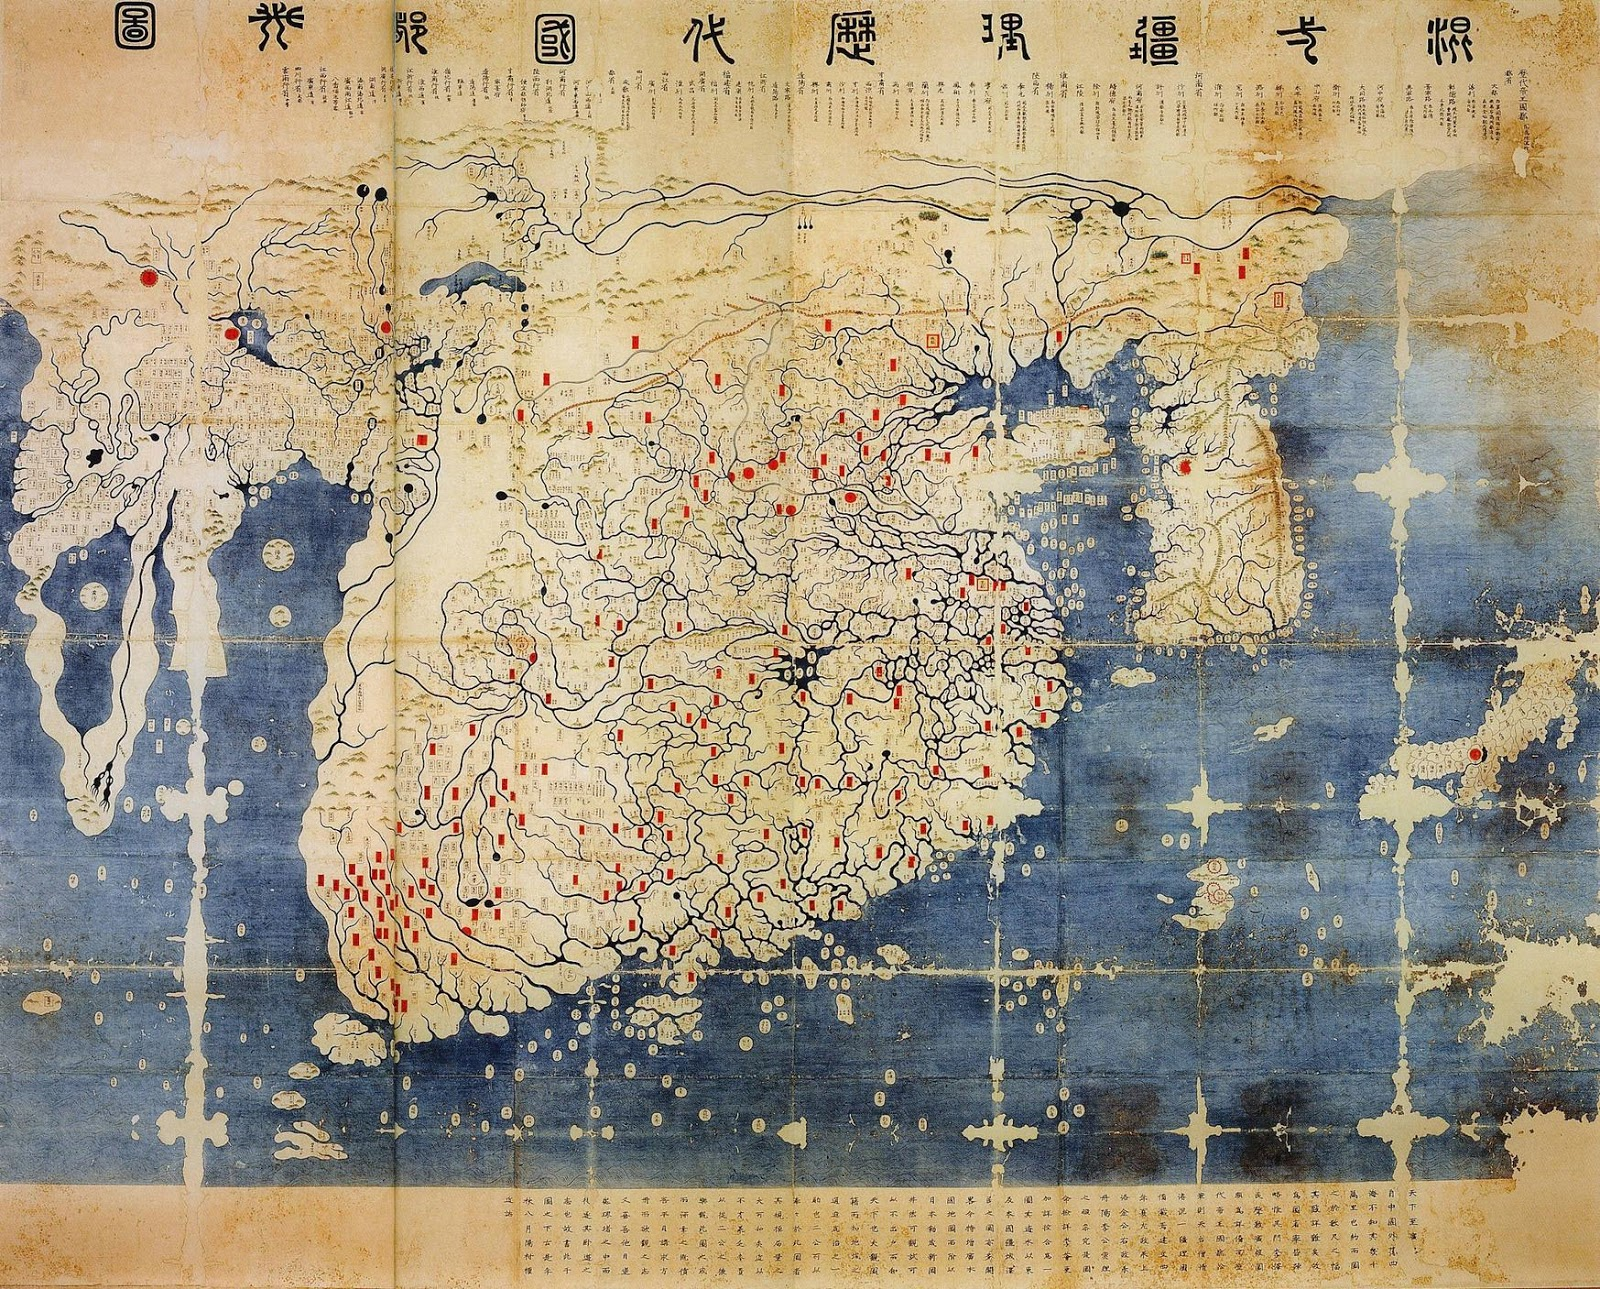 Worldmap from 1402 made in Korea